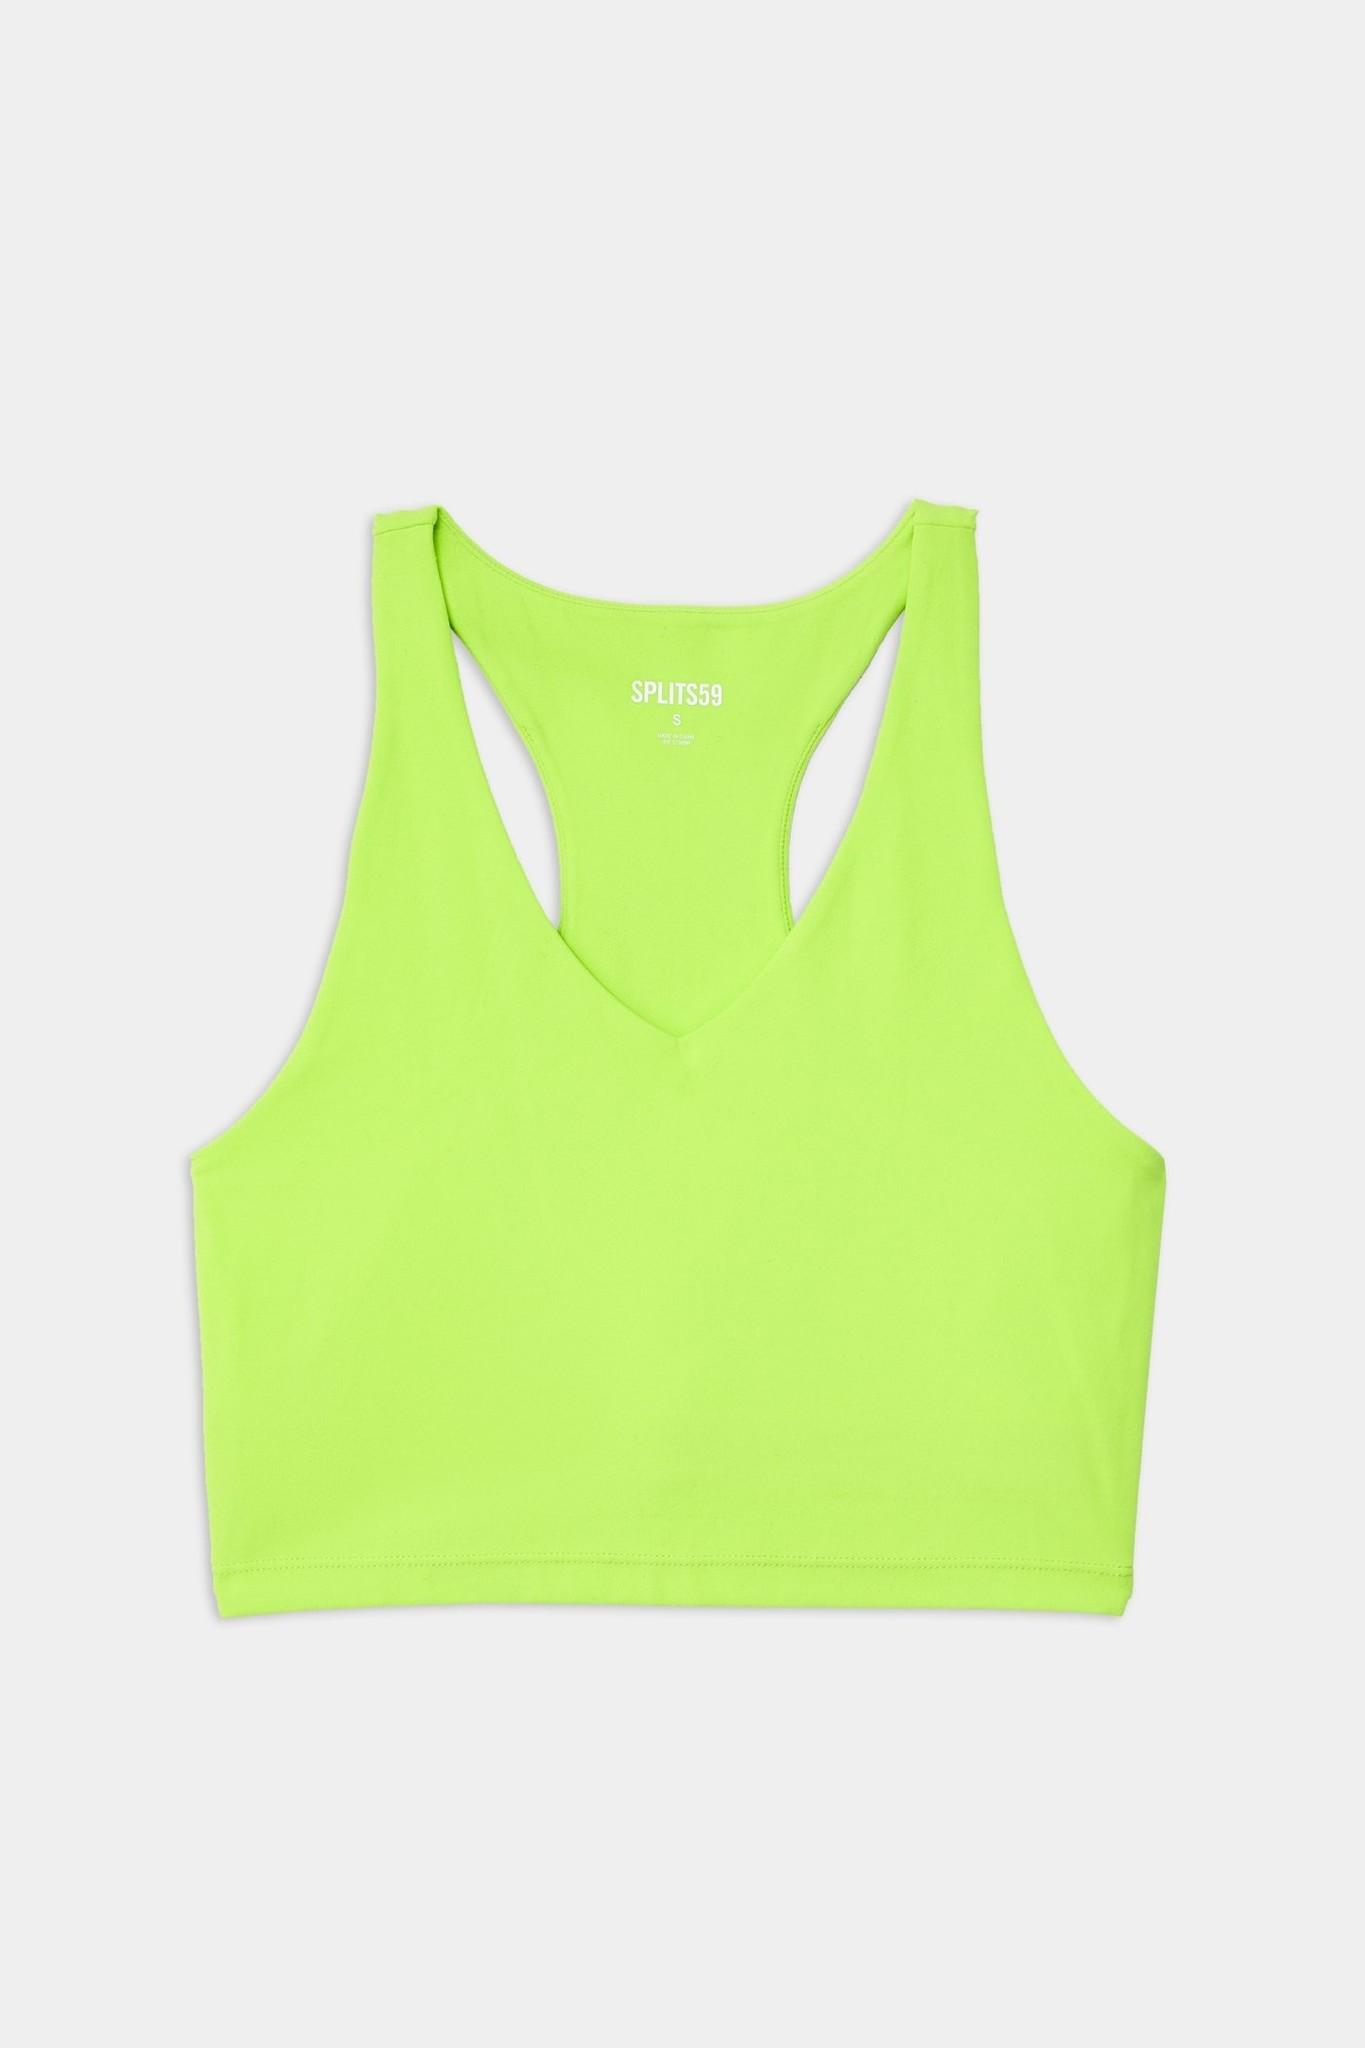 Splits59 Airweight Bralette Neon Lime